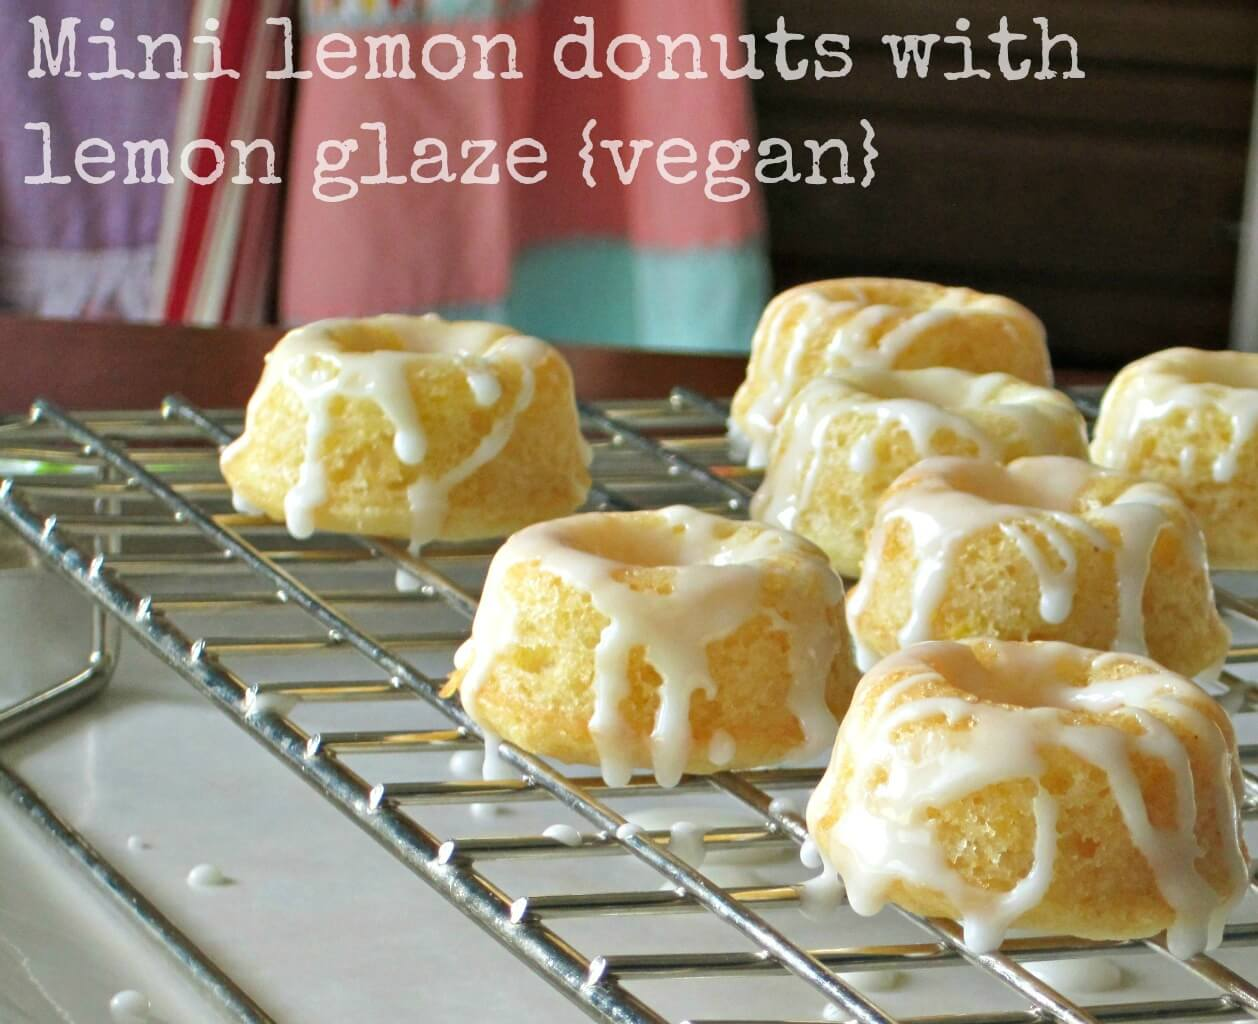 Baked Lemon Donuts with Lemon Glaze